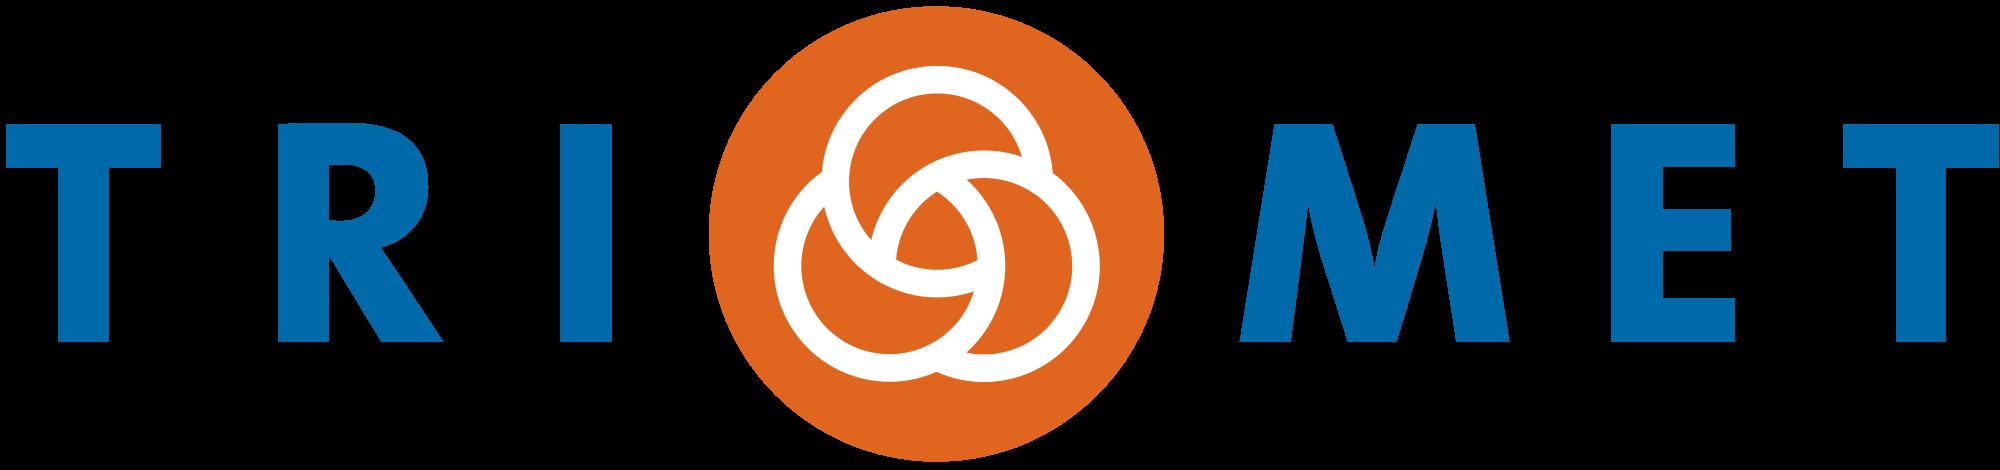 TriMet_logo_2.png